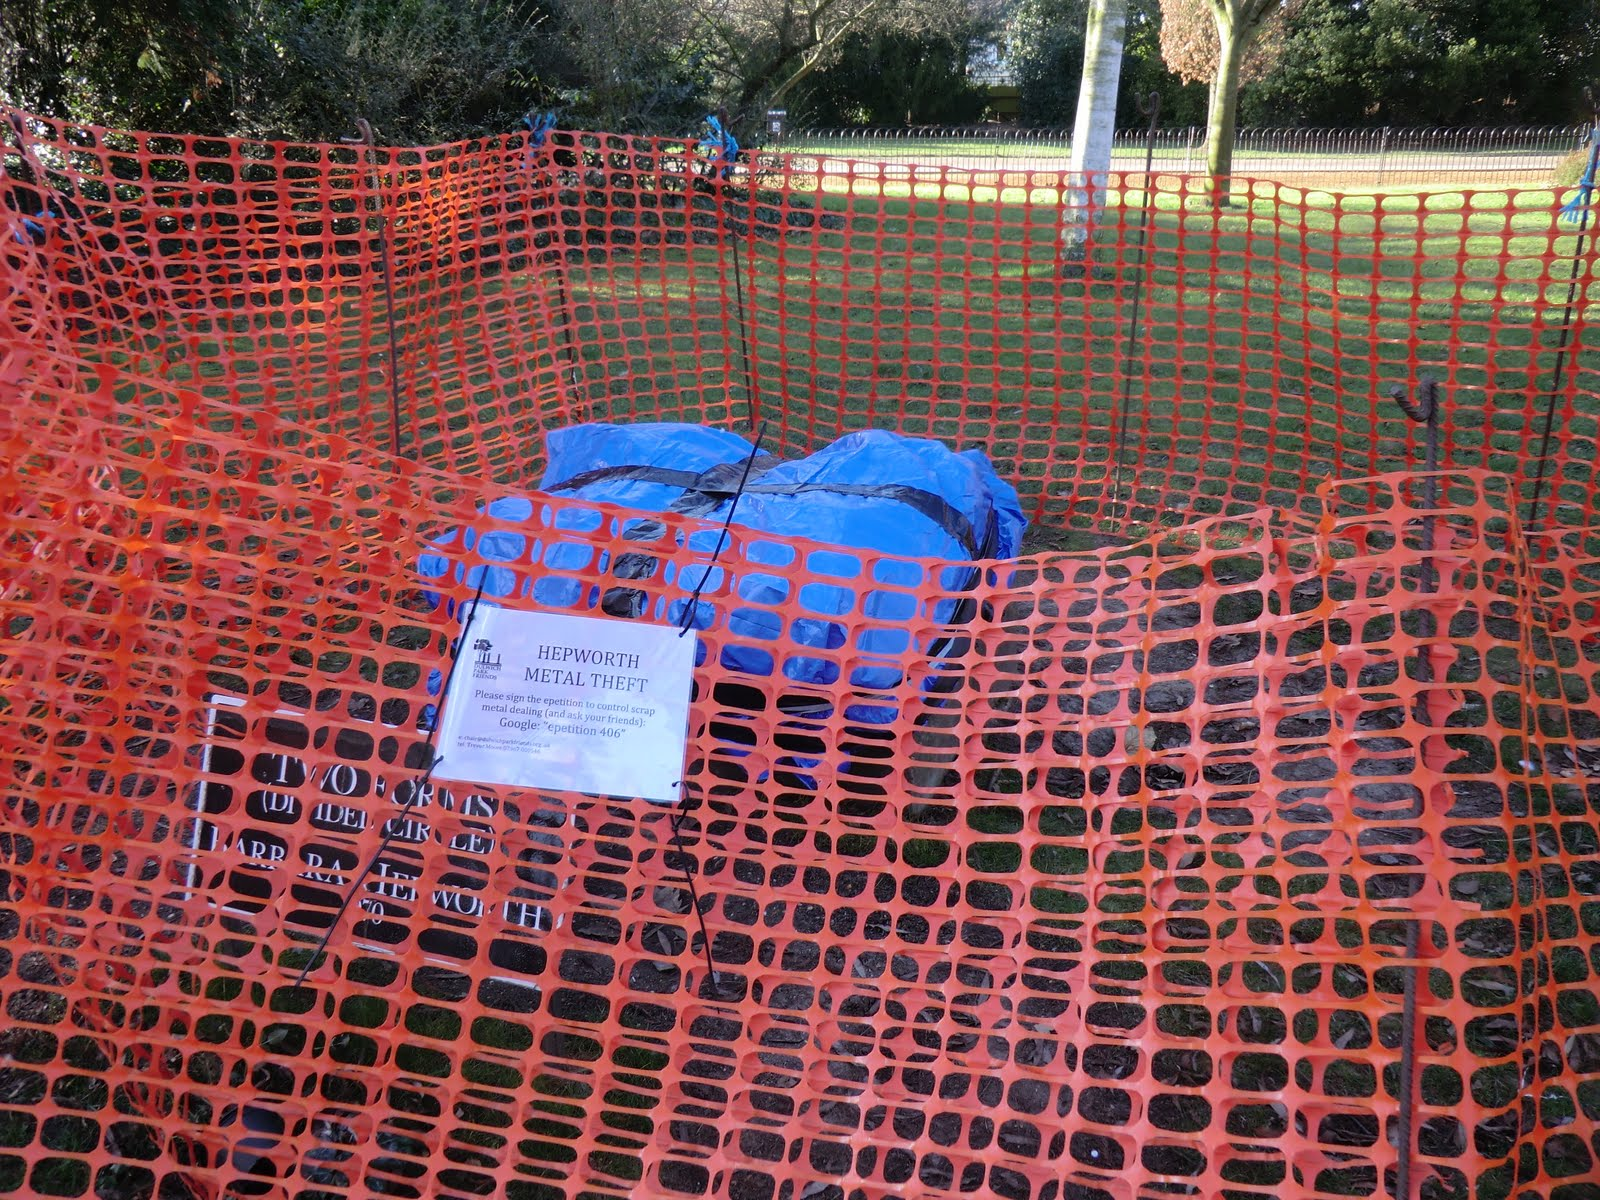 CIMG1579 Missing Hepworth sculpture, Dulwich Park